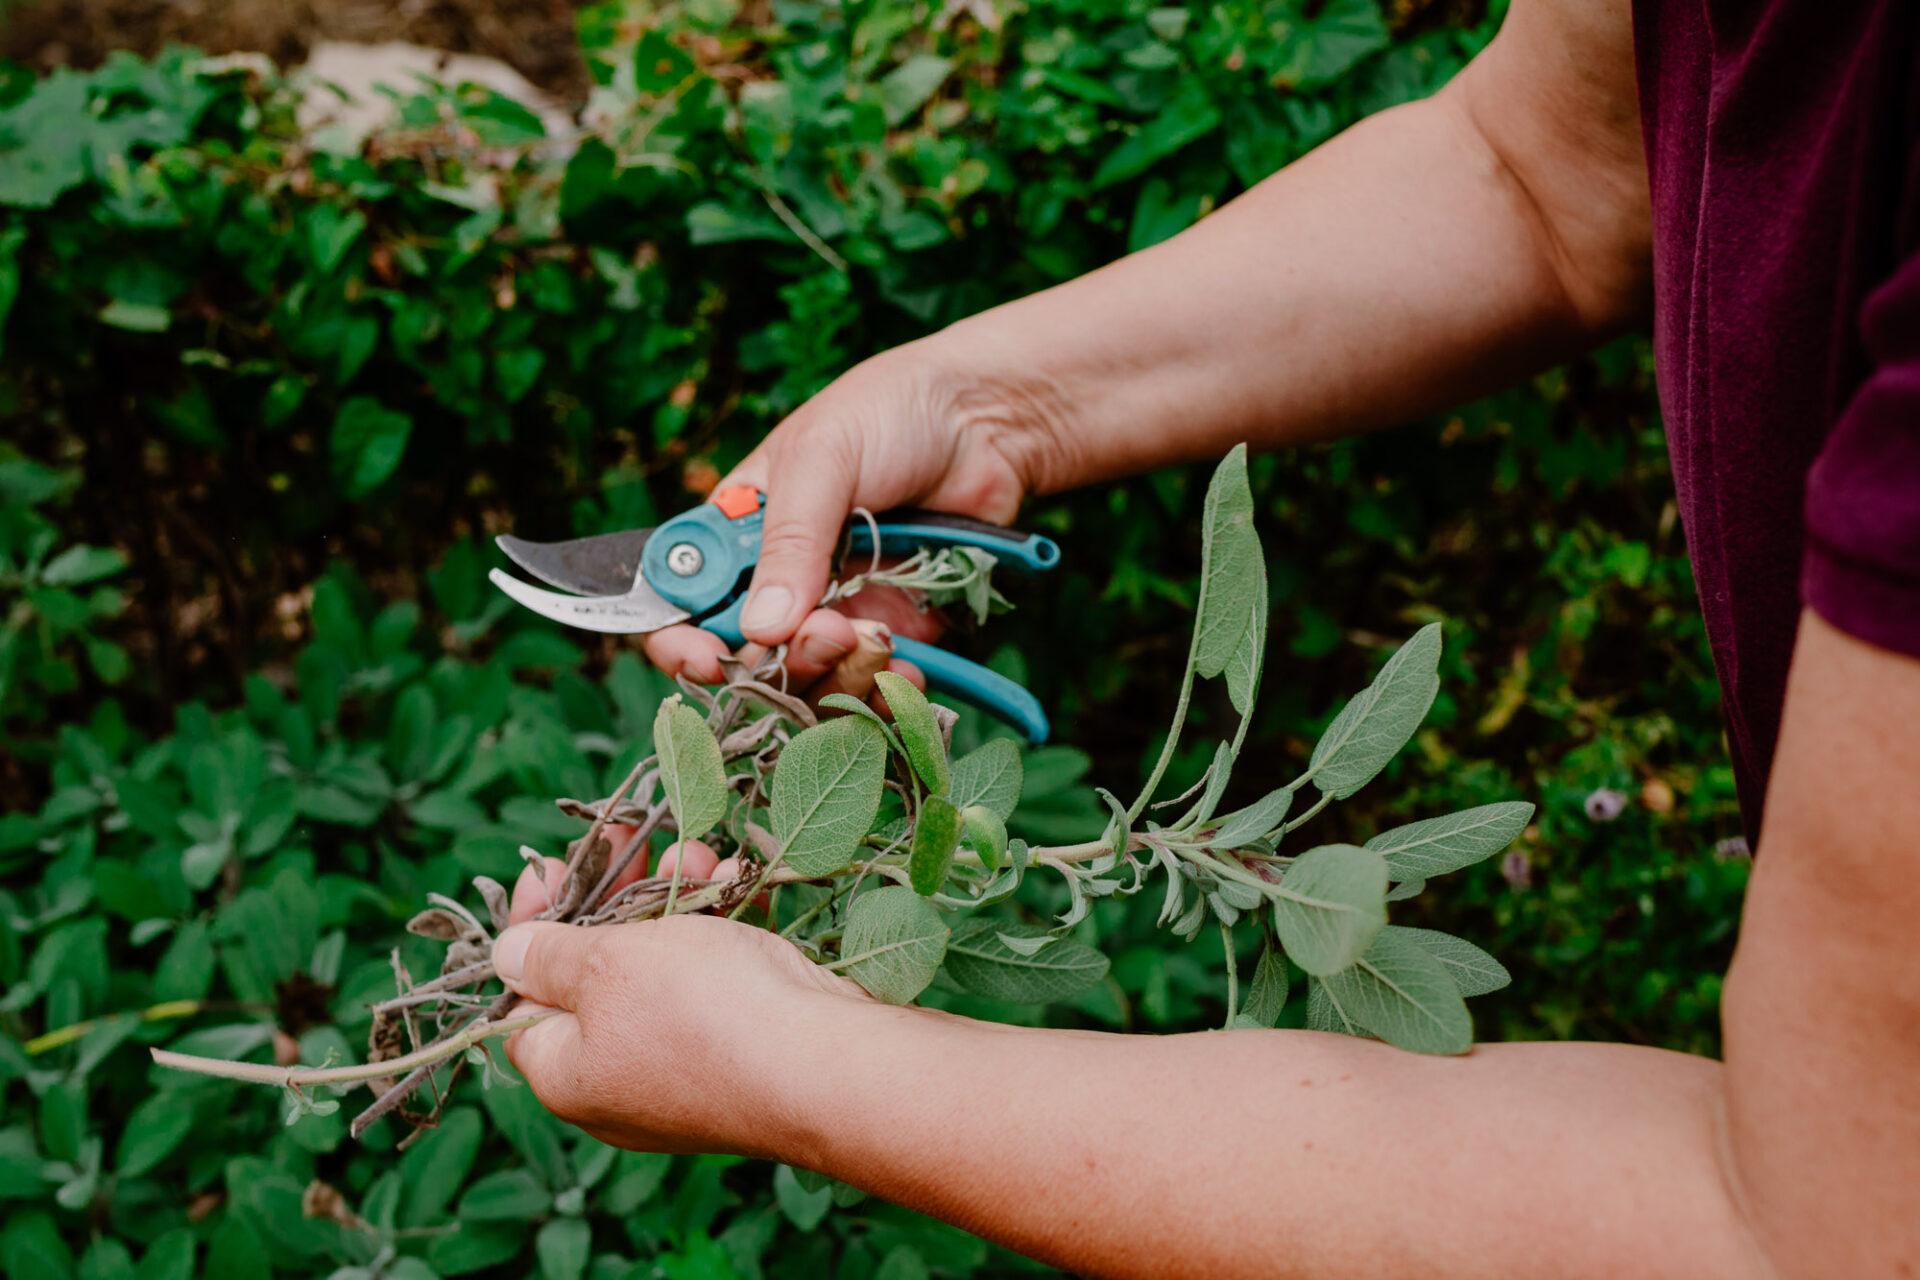 Jardins ouvriers aubervilliers 47 - Dagmara Bojenko - Eco-conscious Weddings, Births & Families